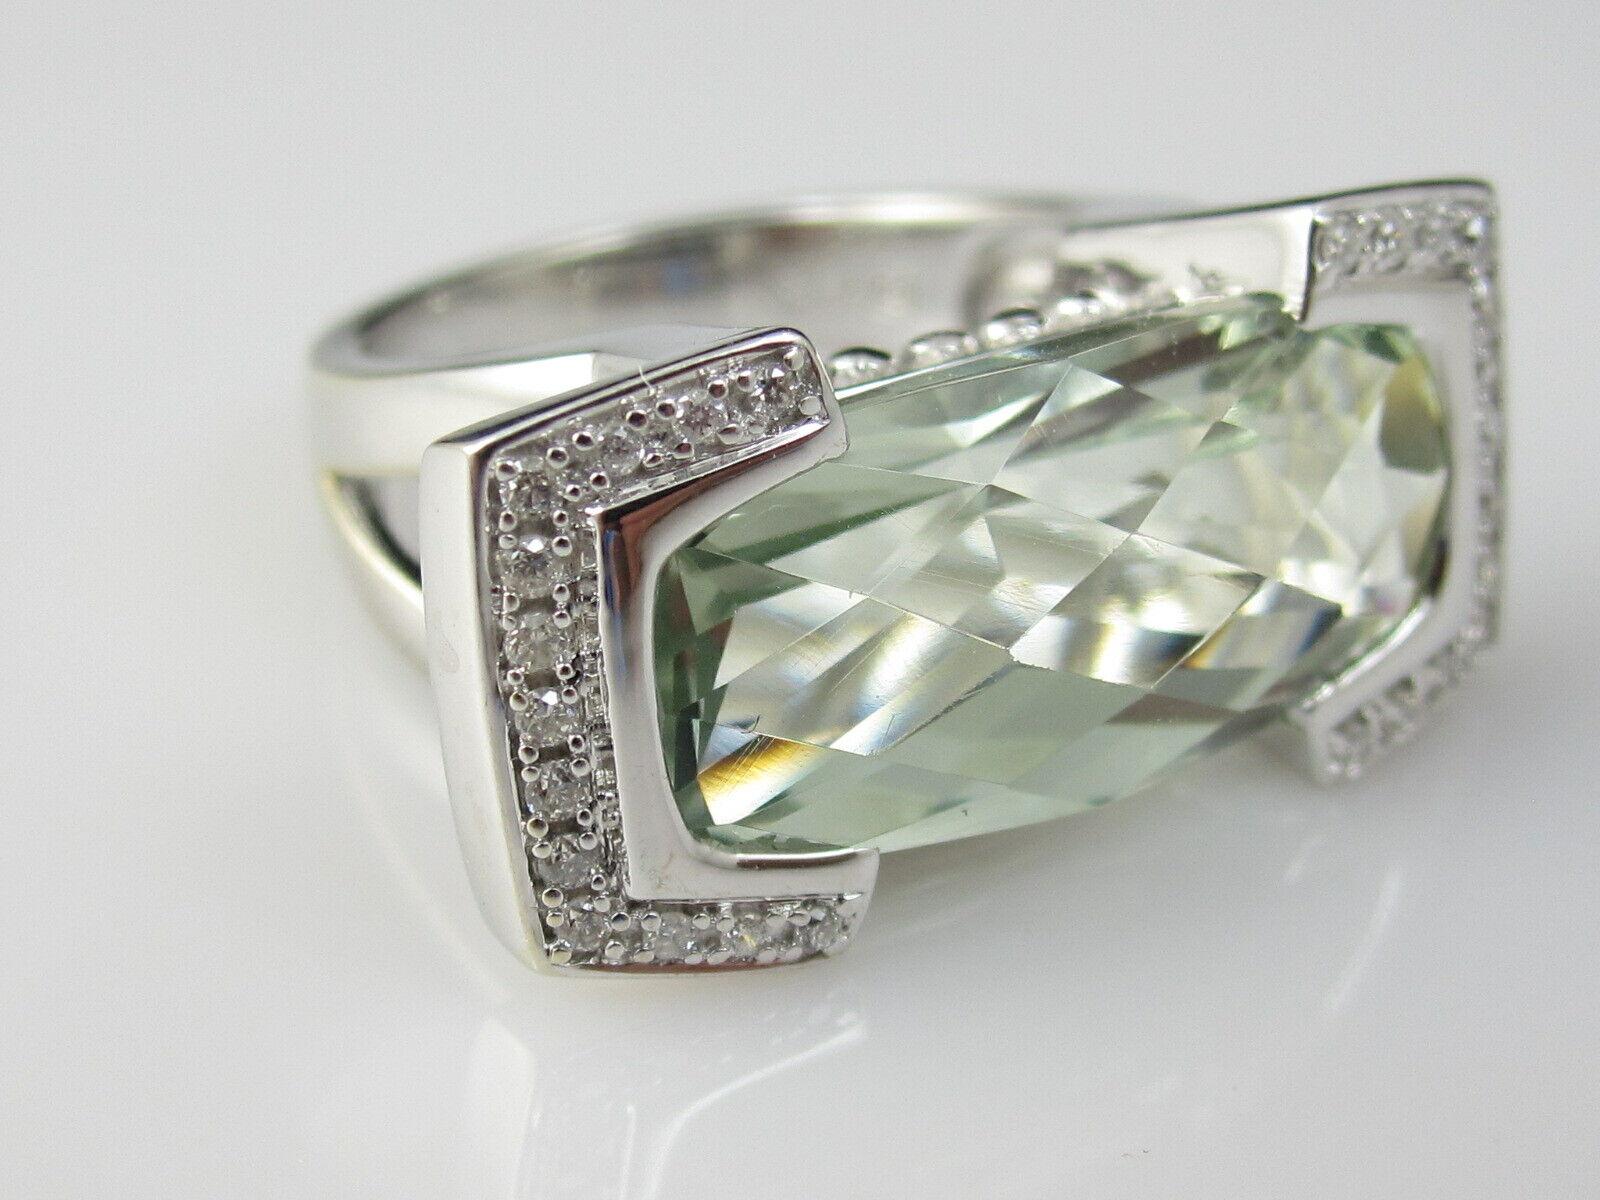 Green Amethyst Diamond Ring 14K White Gold Contemporary Modern Checkerboard Cut - $495.00